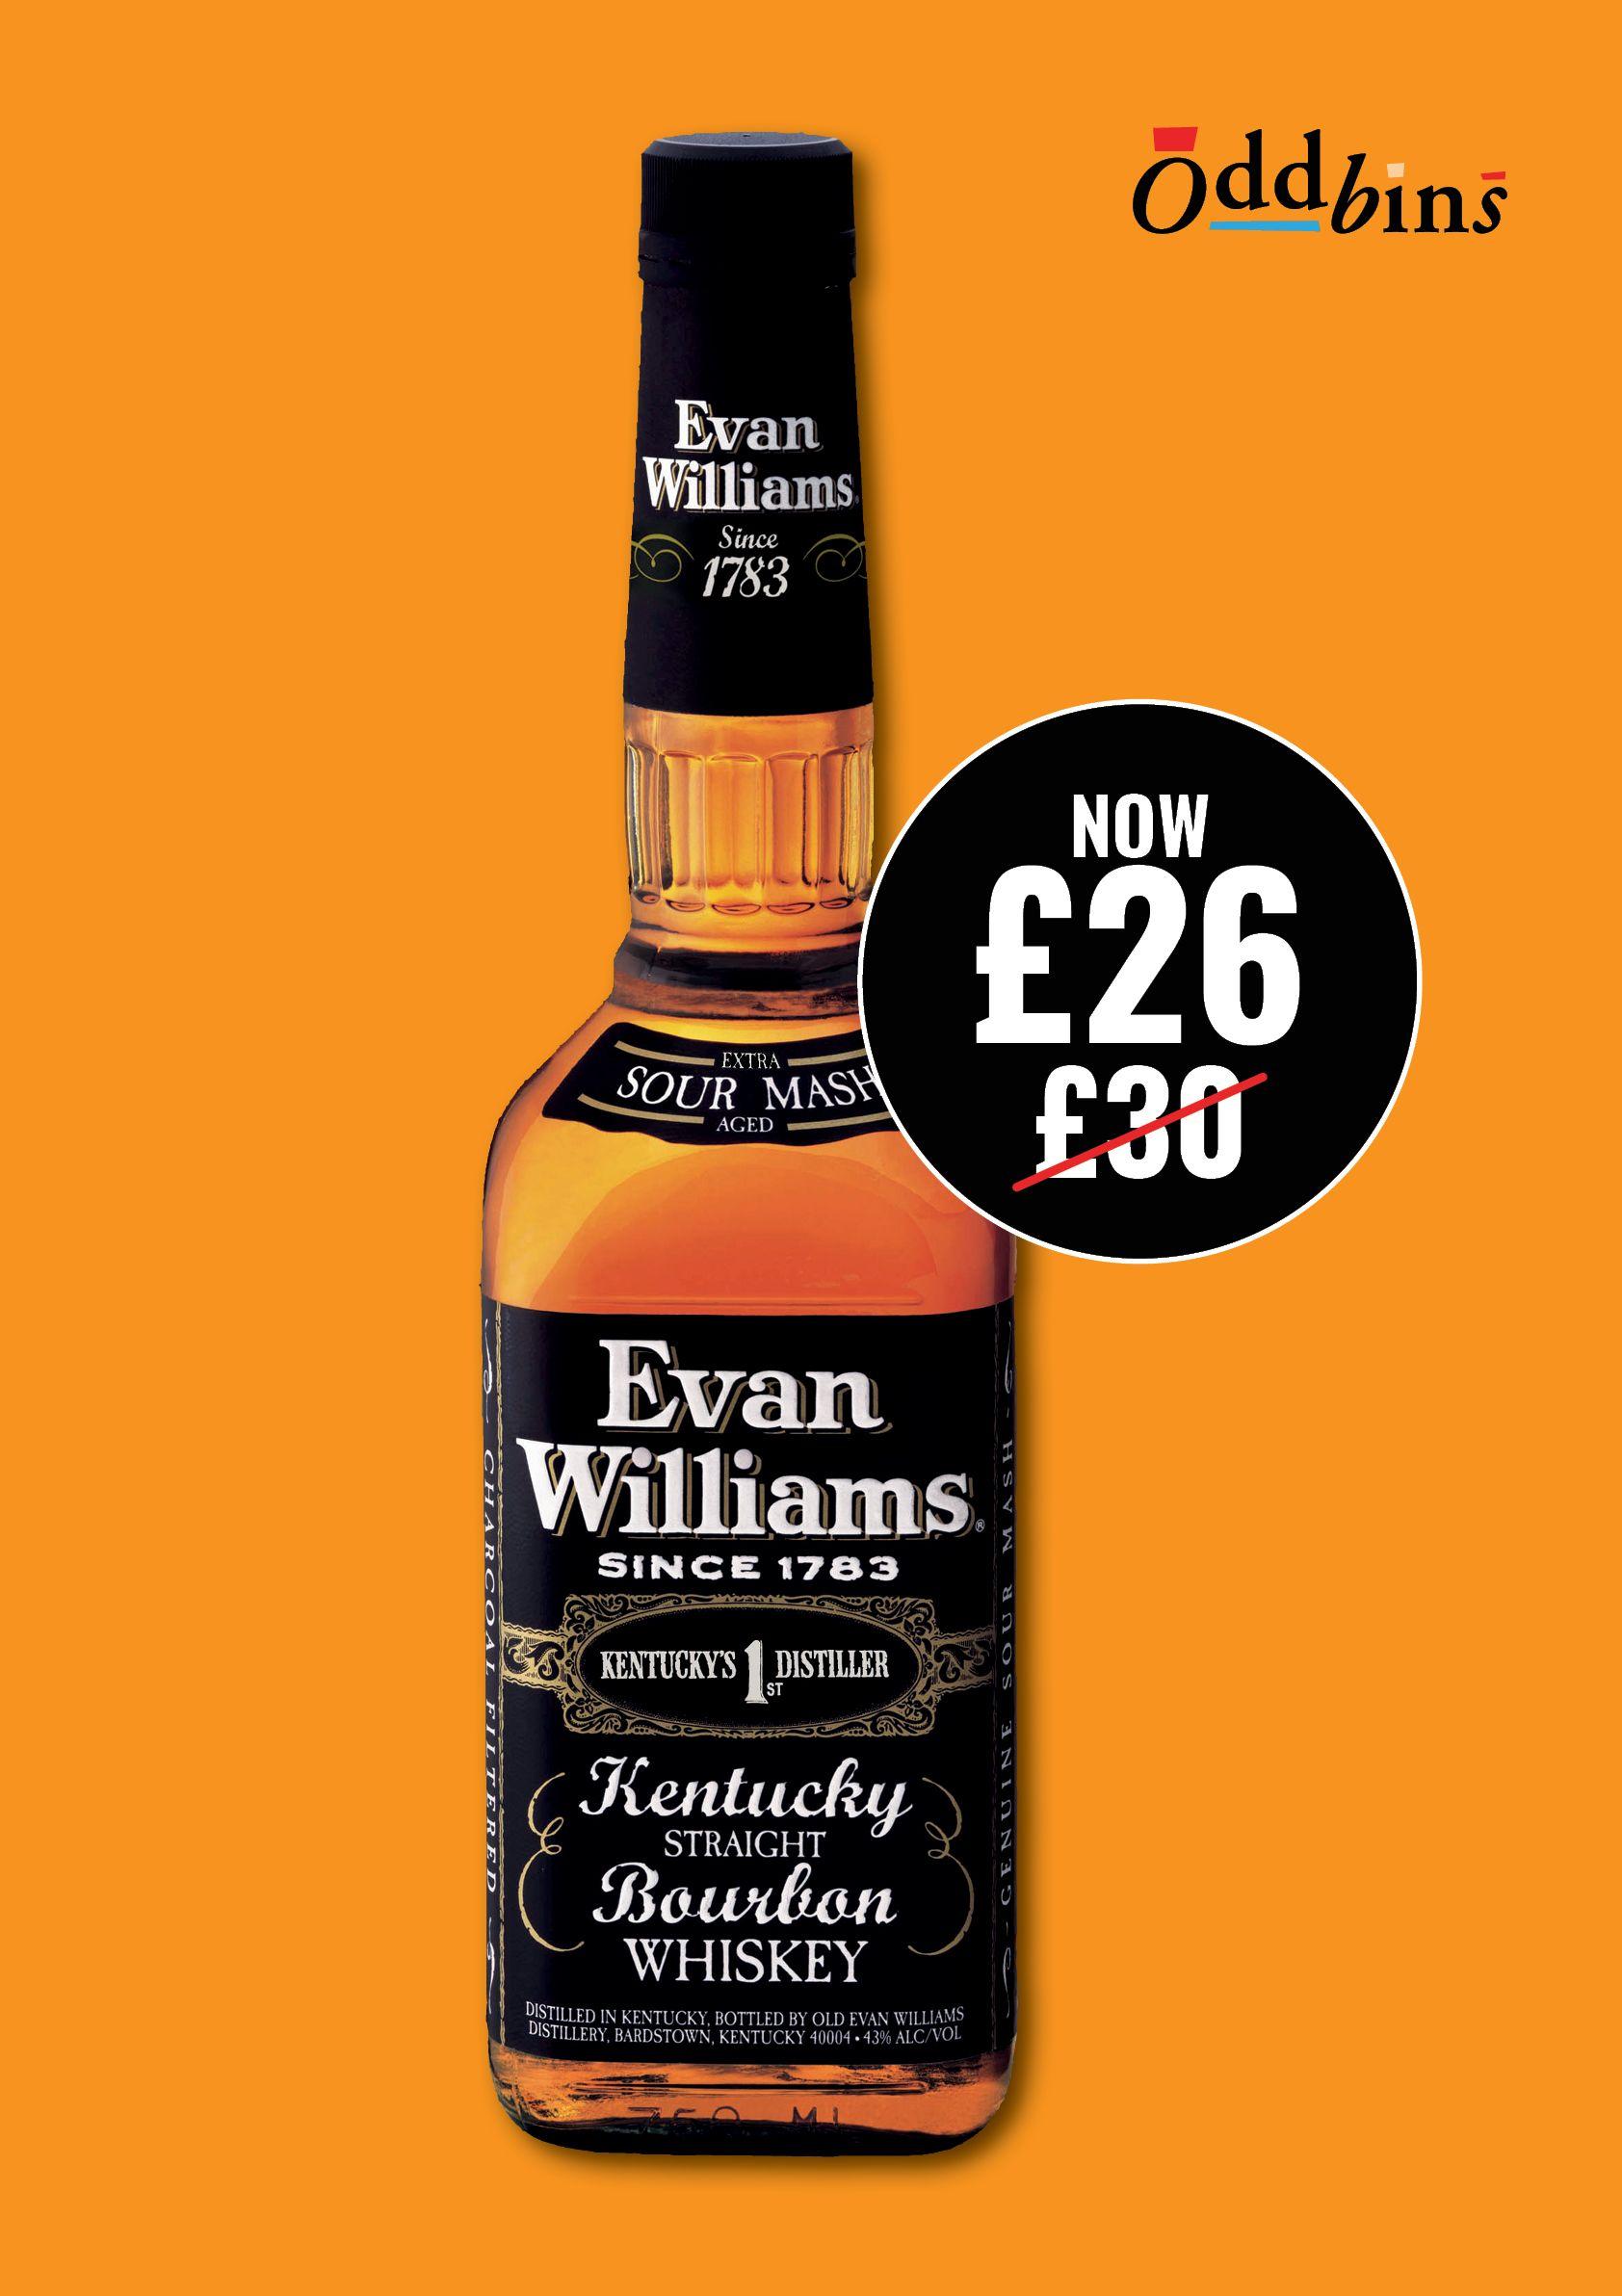 Evan williams extra age bourbon kentucky straight